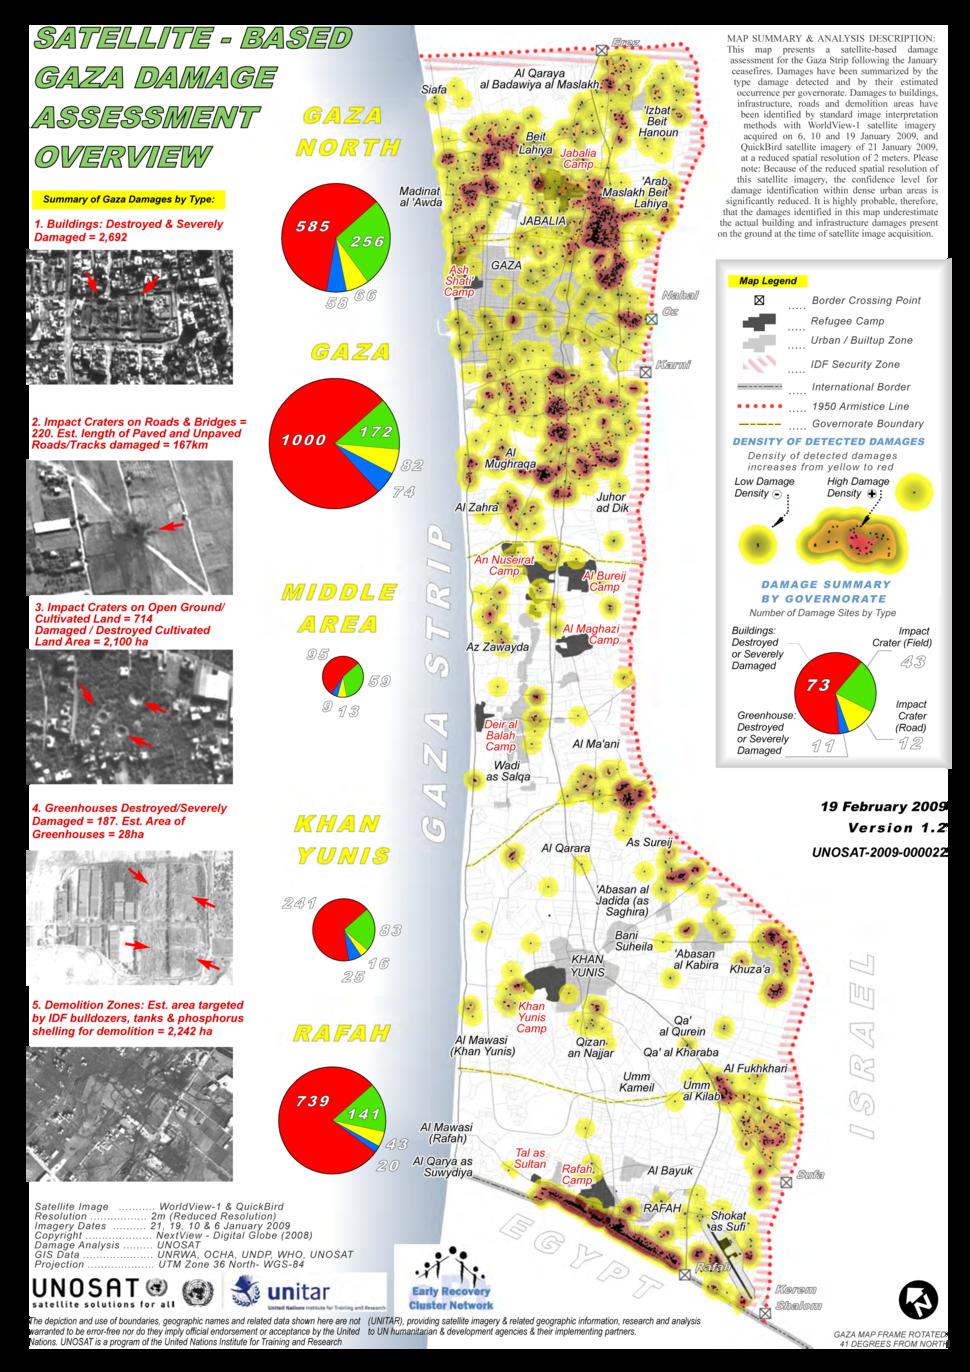 UNOSAT GazaStrip Damage Review 19Feb09 v3 Lowres